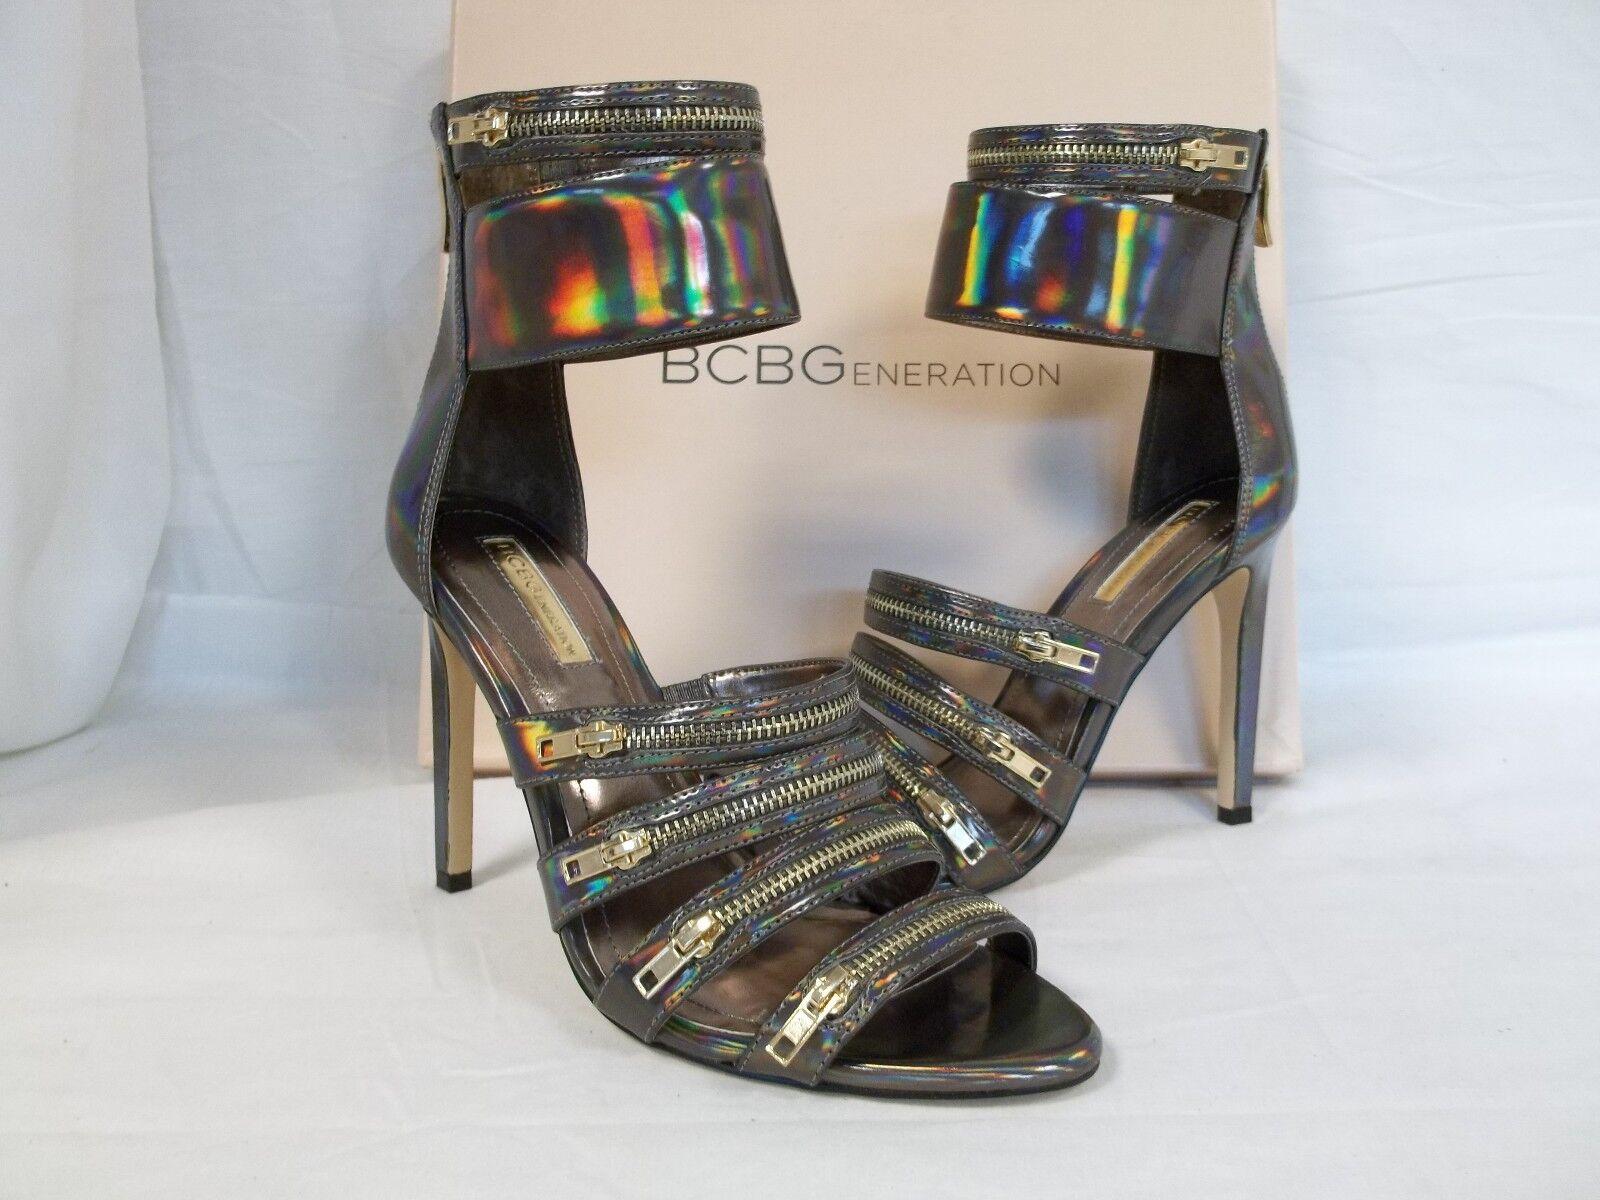 BCBGeneration BCBG Size 6.5 M Casey Bronze Hologram Heels New Womens Shoes NWB